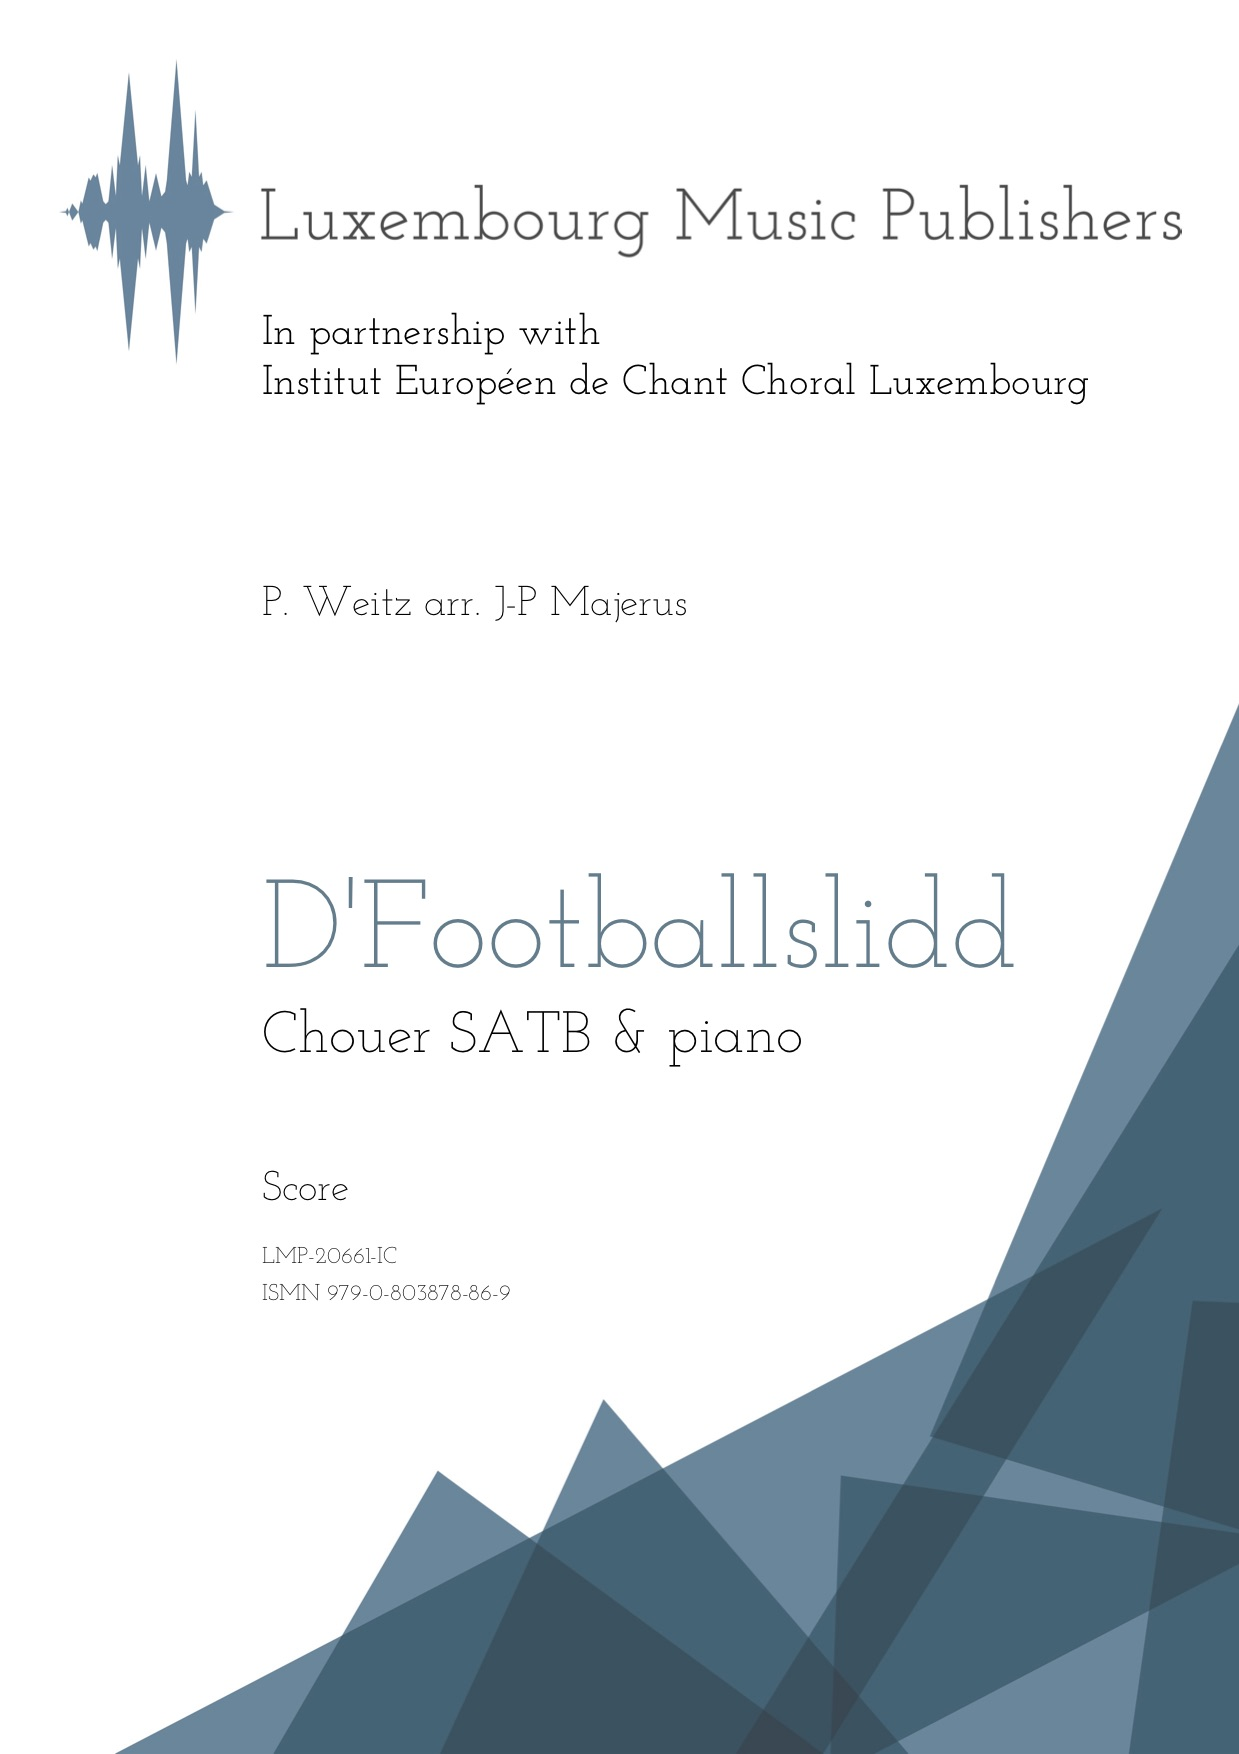 D'Footballslidd.SheetMusicbyJean PaulMajerus,composer.BasedonatraditionalluxembourgishfolksongbyP.Weitz.MusicforchoirSATBandpiano.Musicformixedchoirandpiano.MusicforSoprano,Alto,Tenor,Bassandpiano.Score.